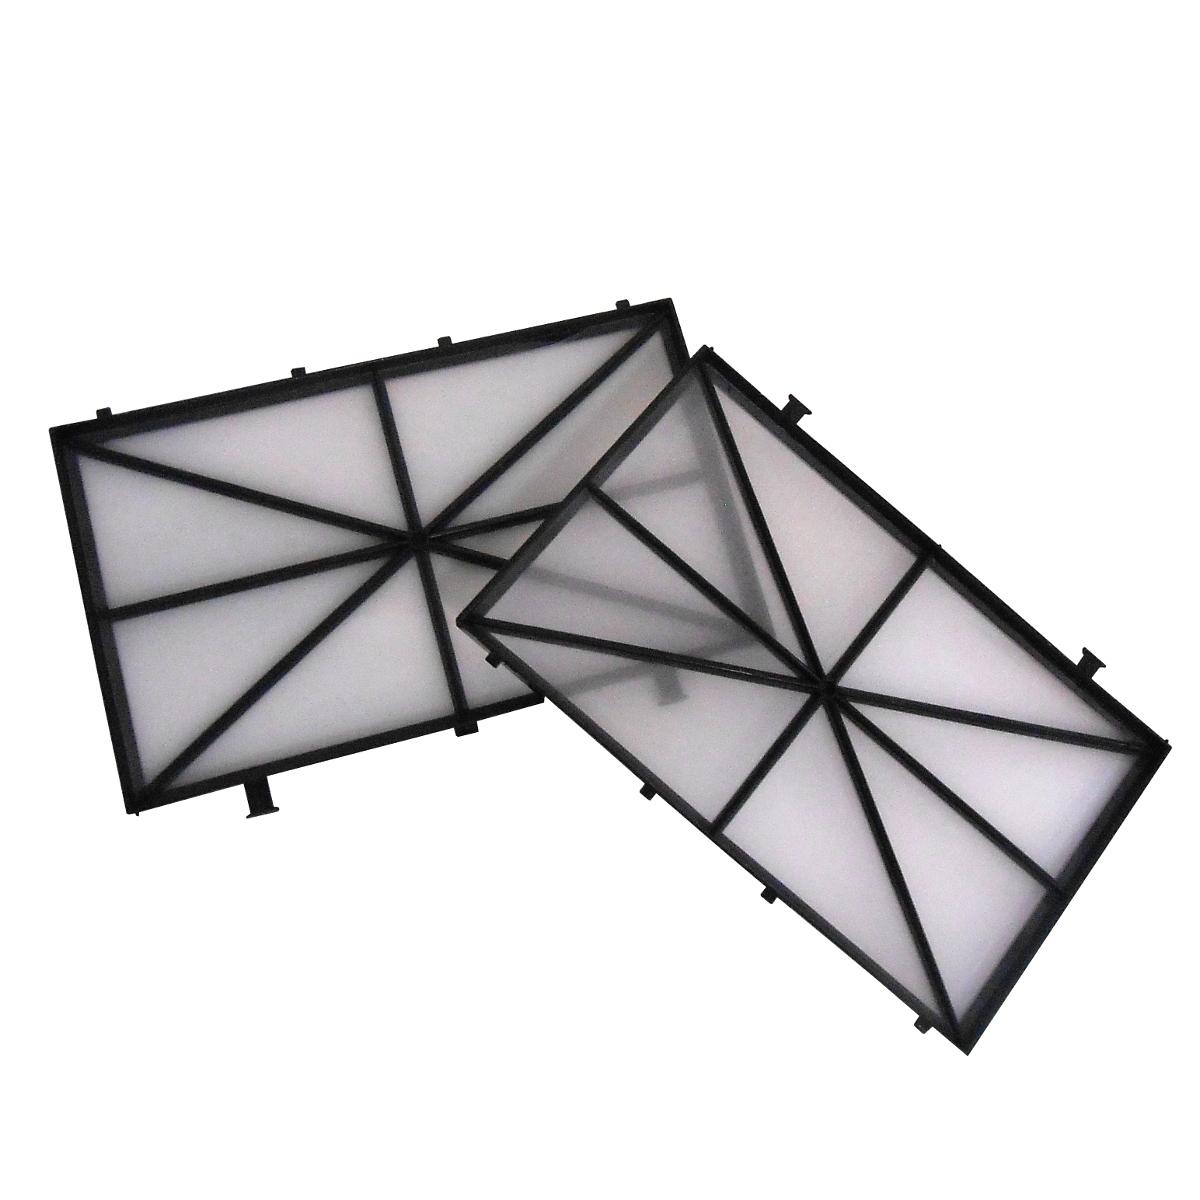 4 filtres printemps pour robot Zenit 20/30 | MAYTRONICS